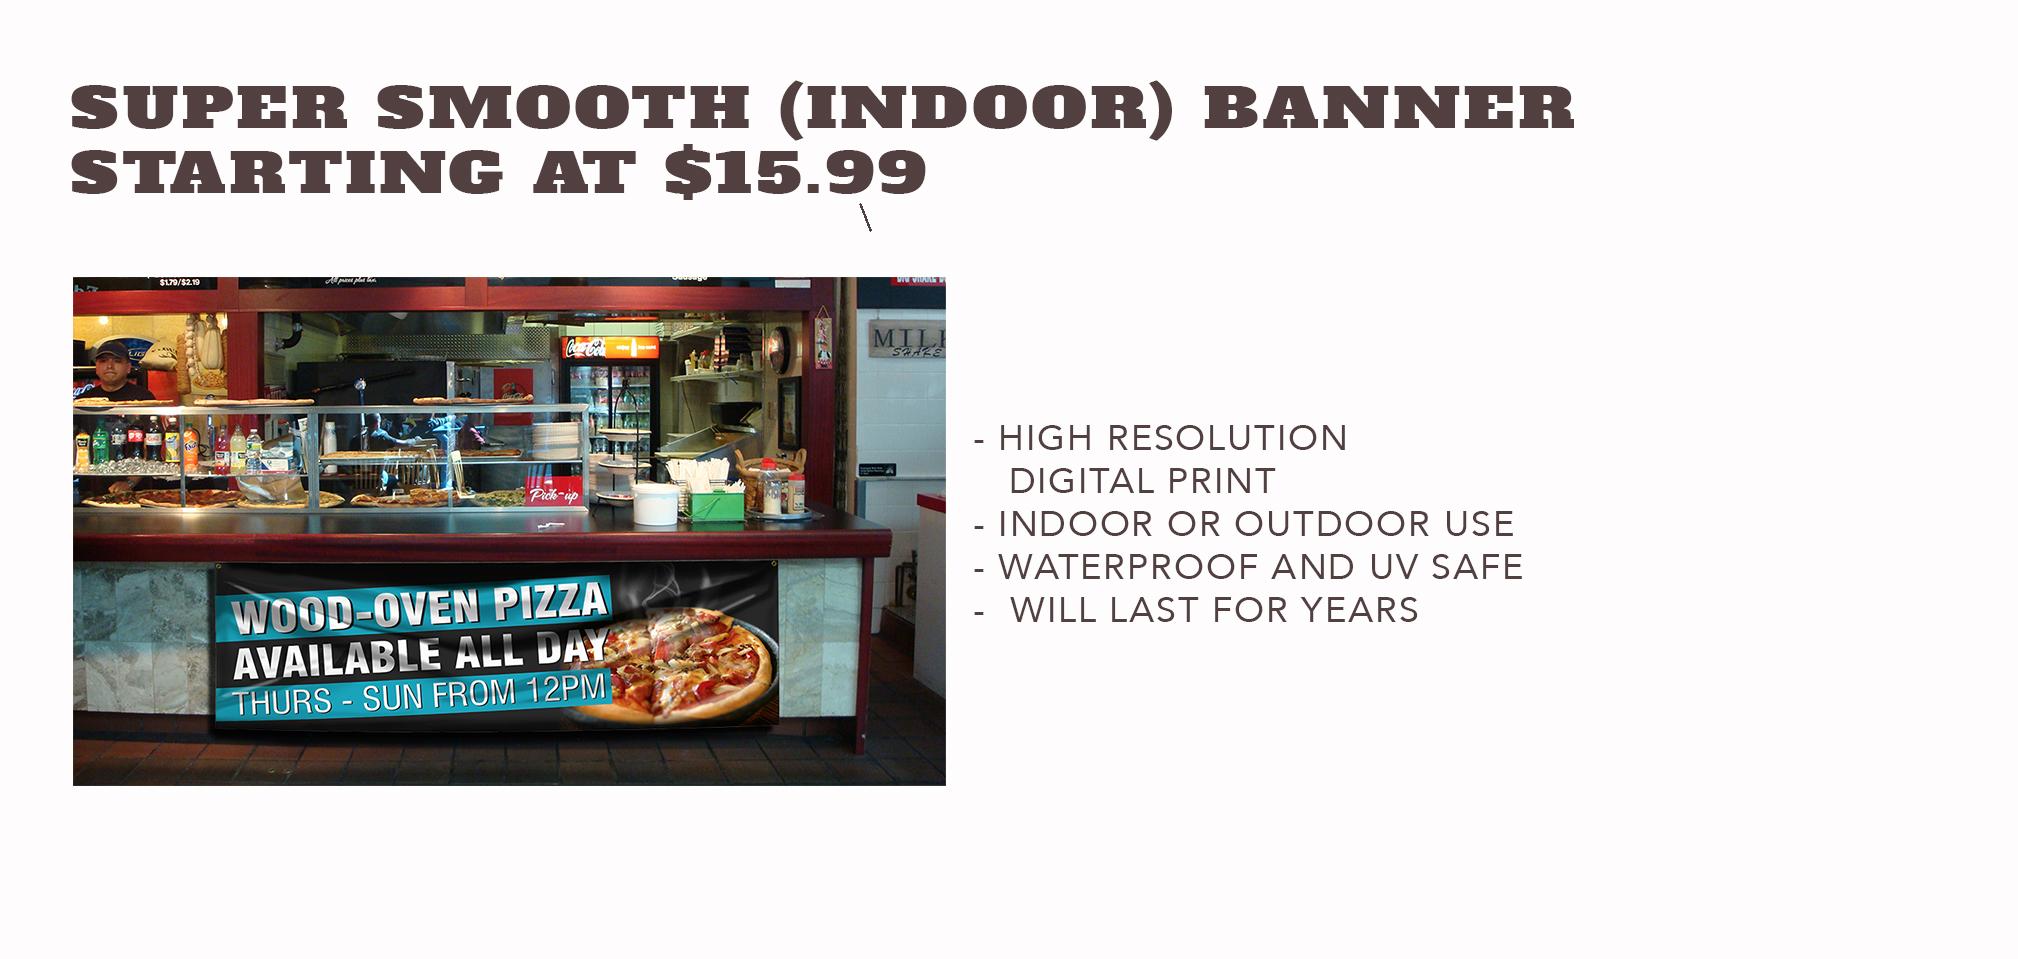 Super Smooth Banner - Starting at $15.99